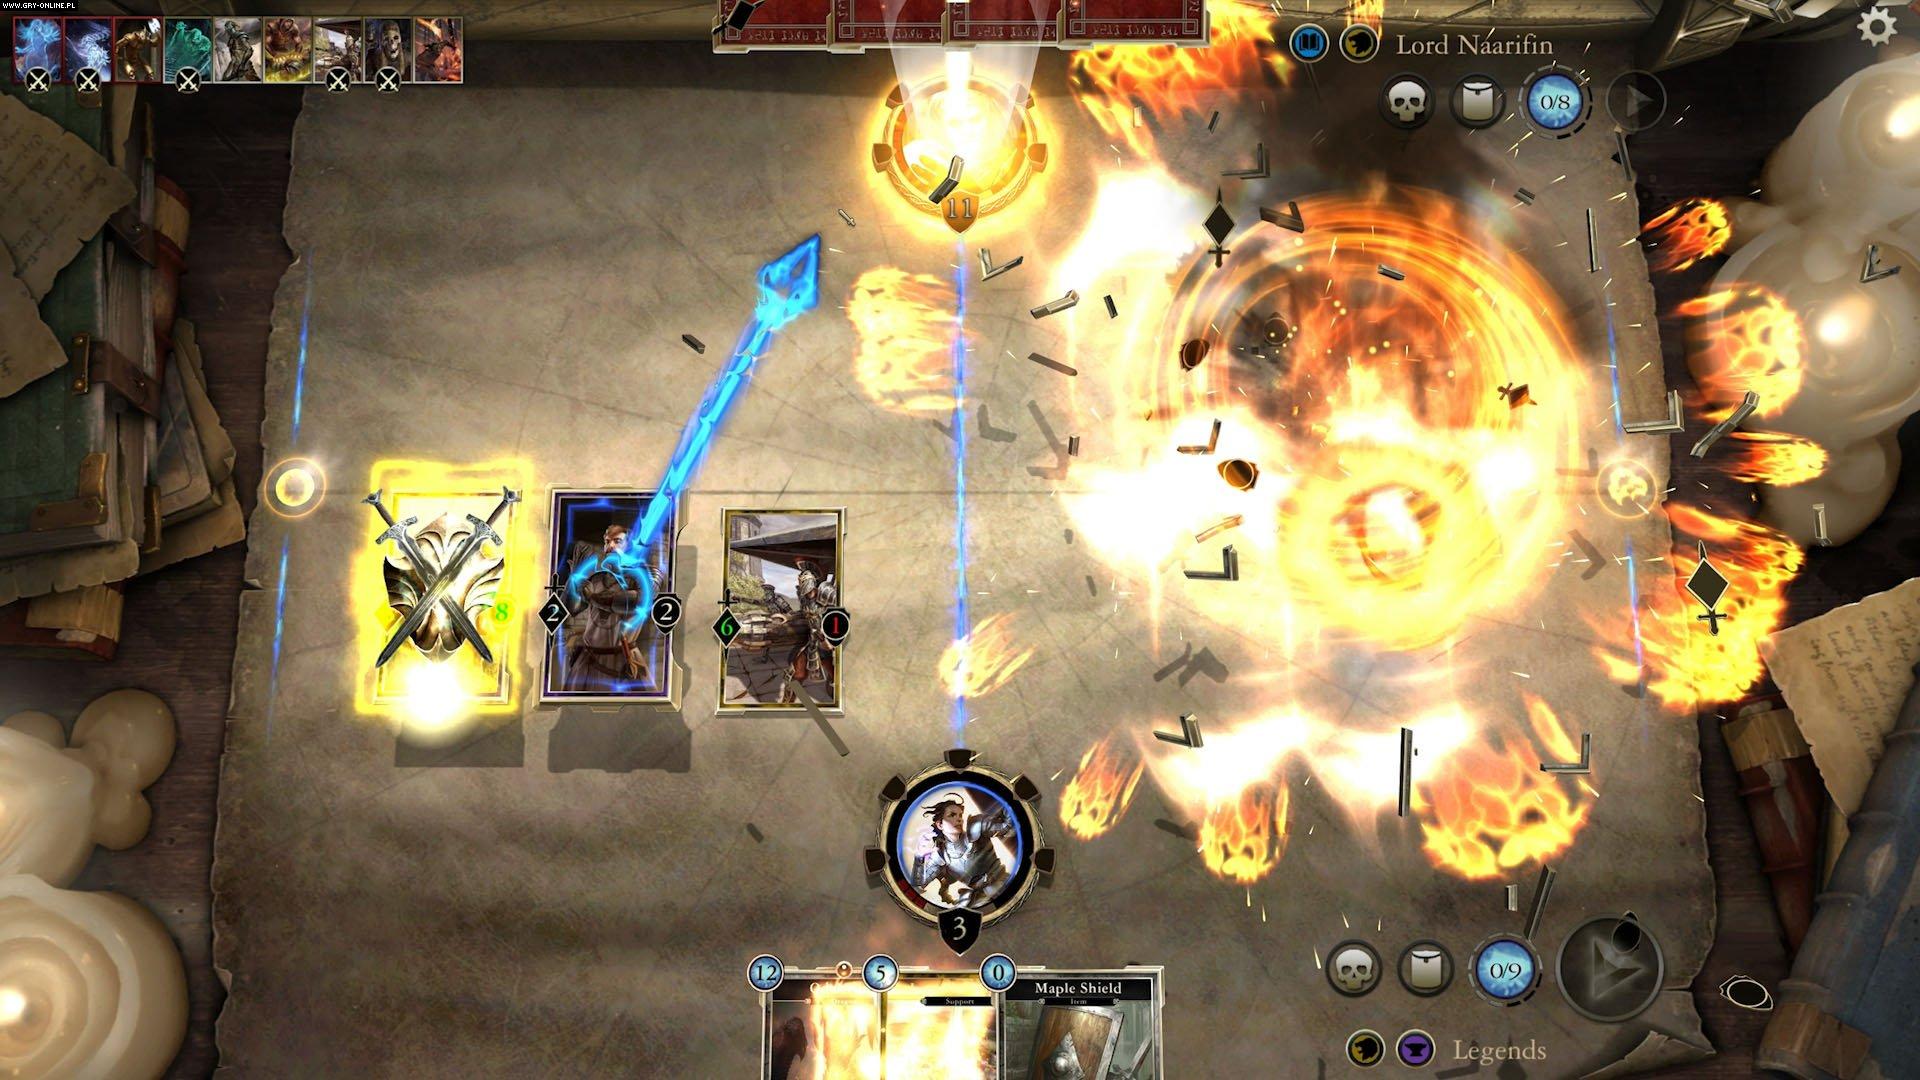 The Elder Scrolls: Legends PC, iOS Games Image 3/6, Bethesda Softworks